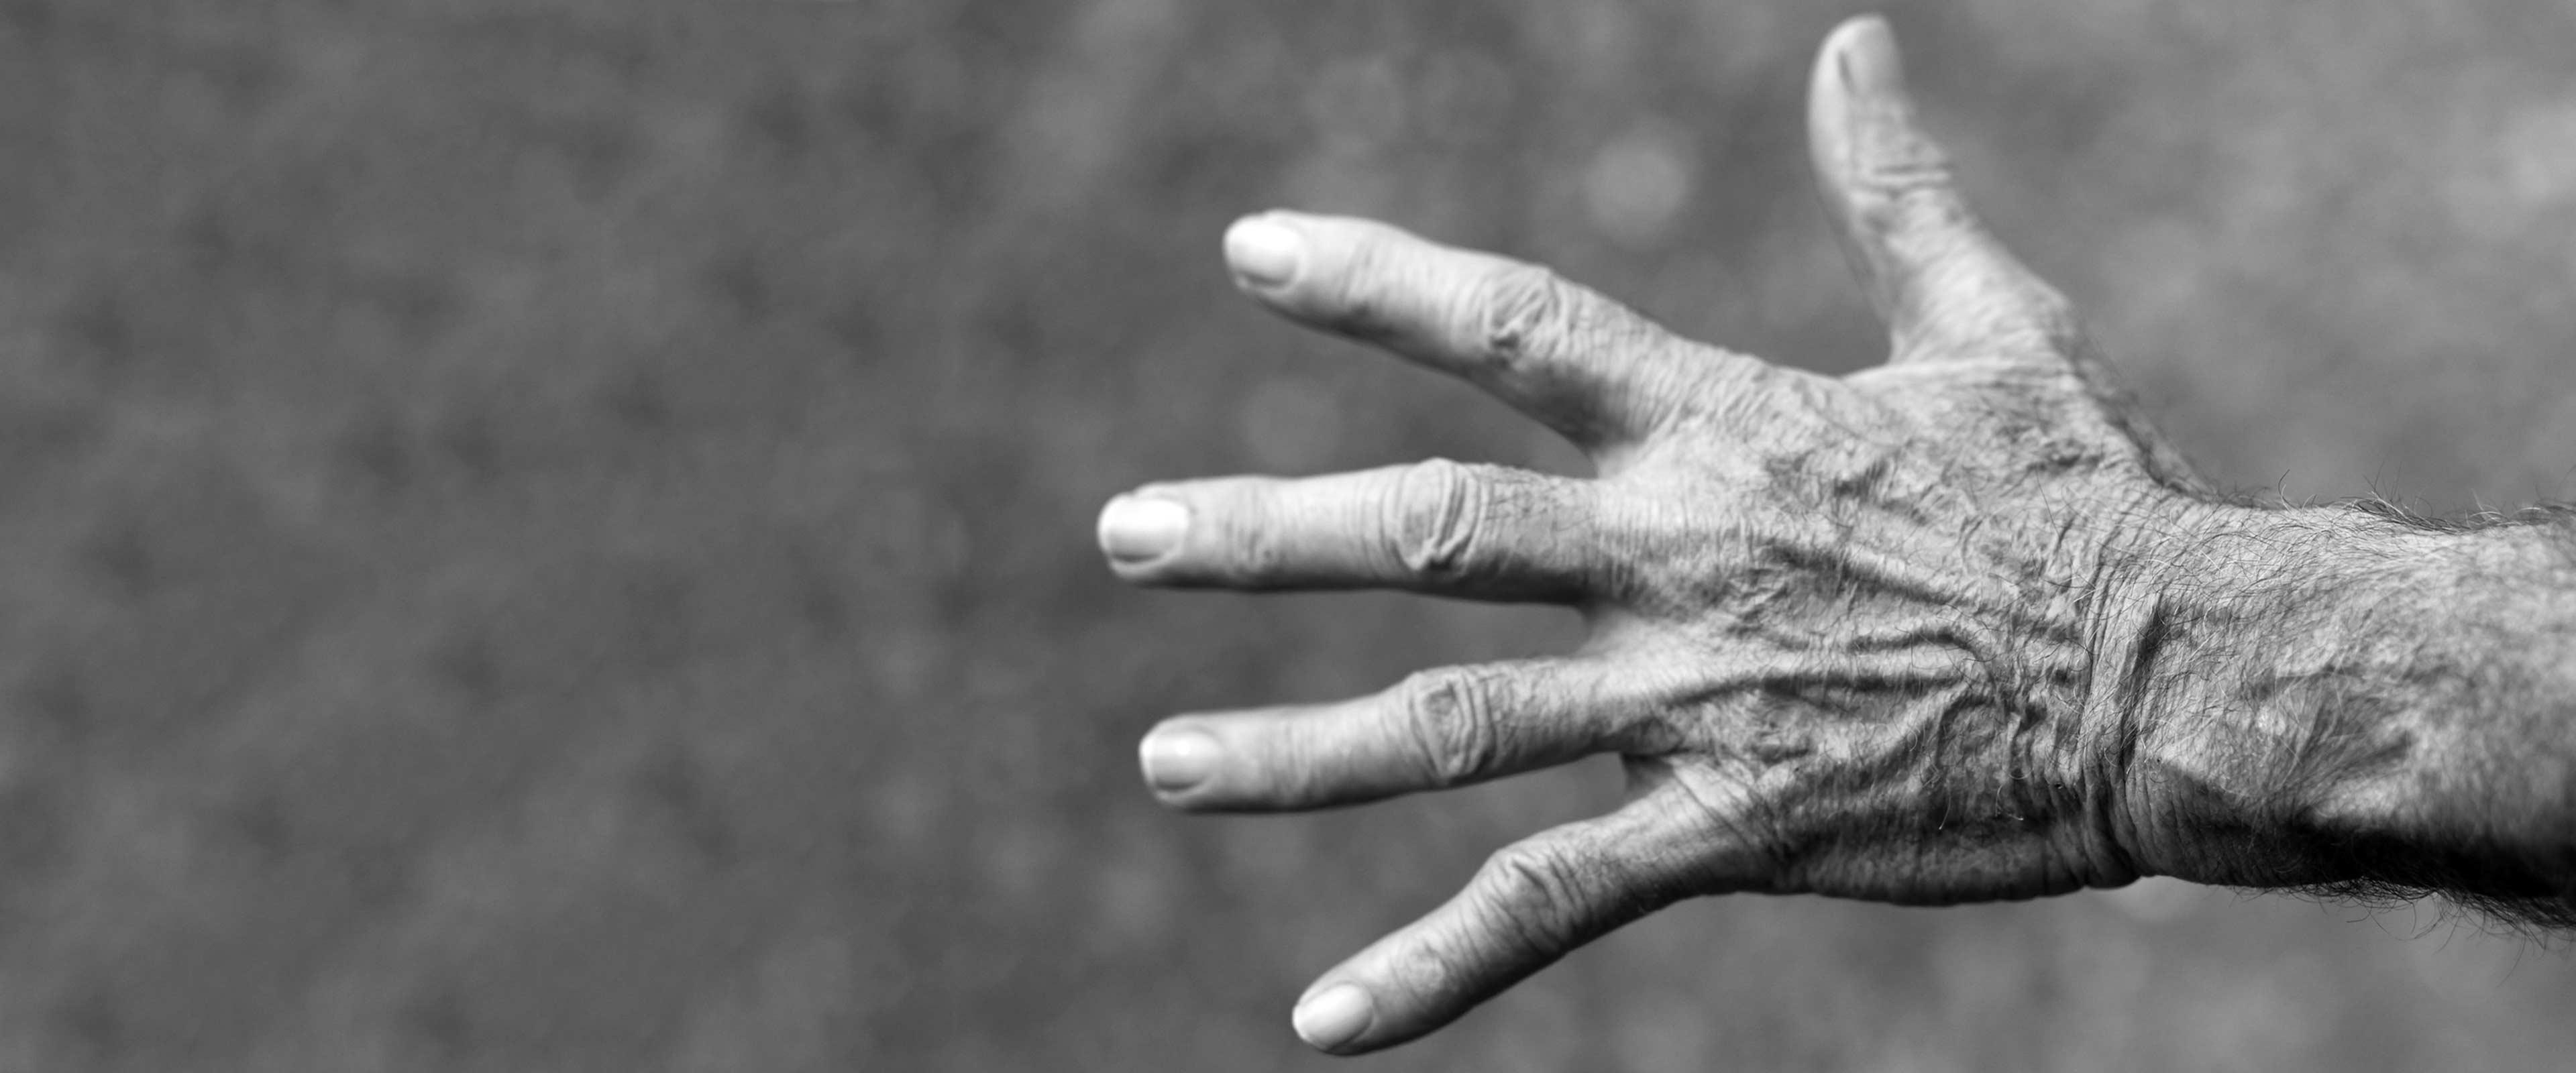 rheuma-arthritis-whatshealth